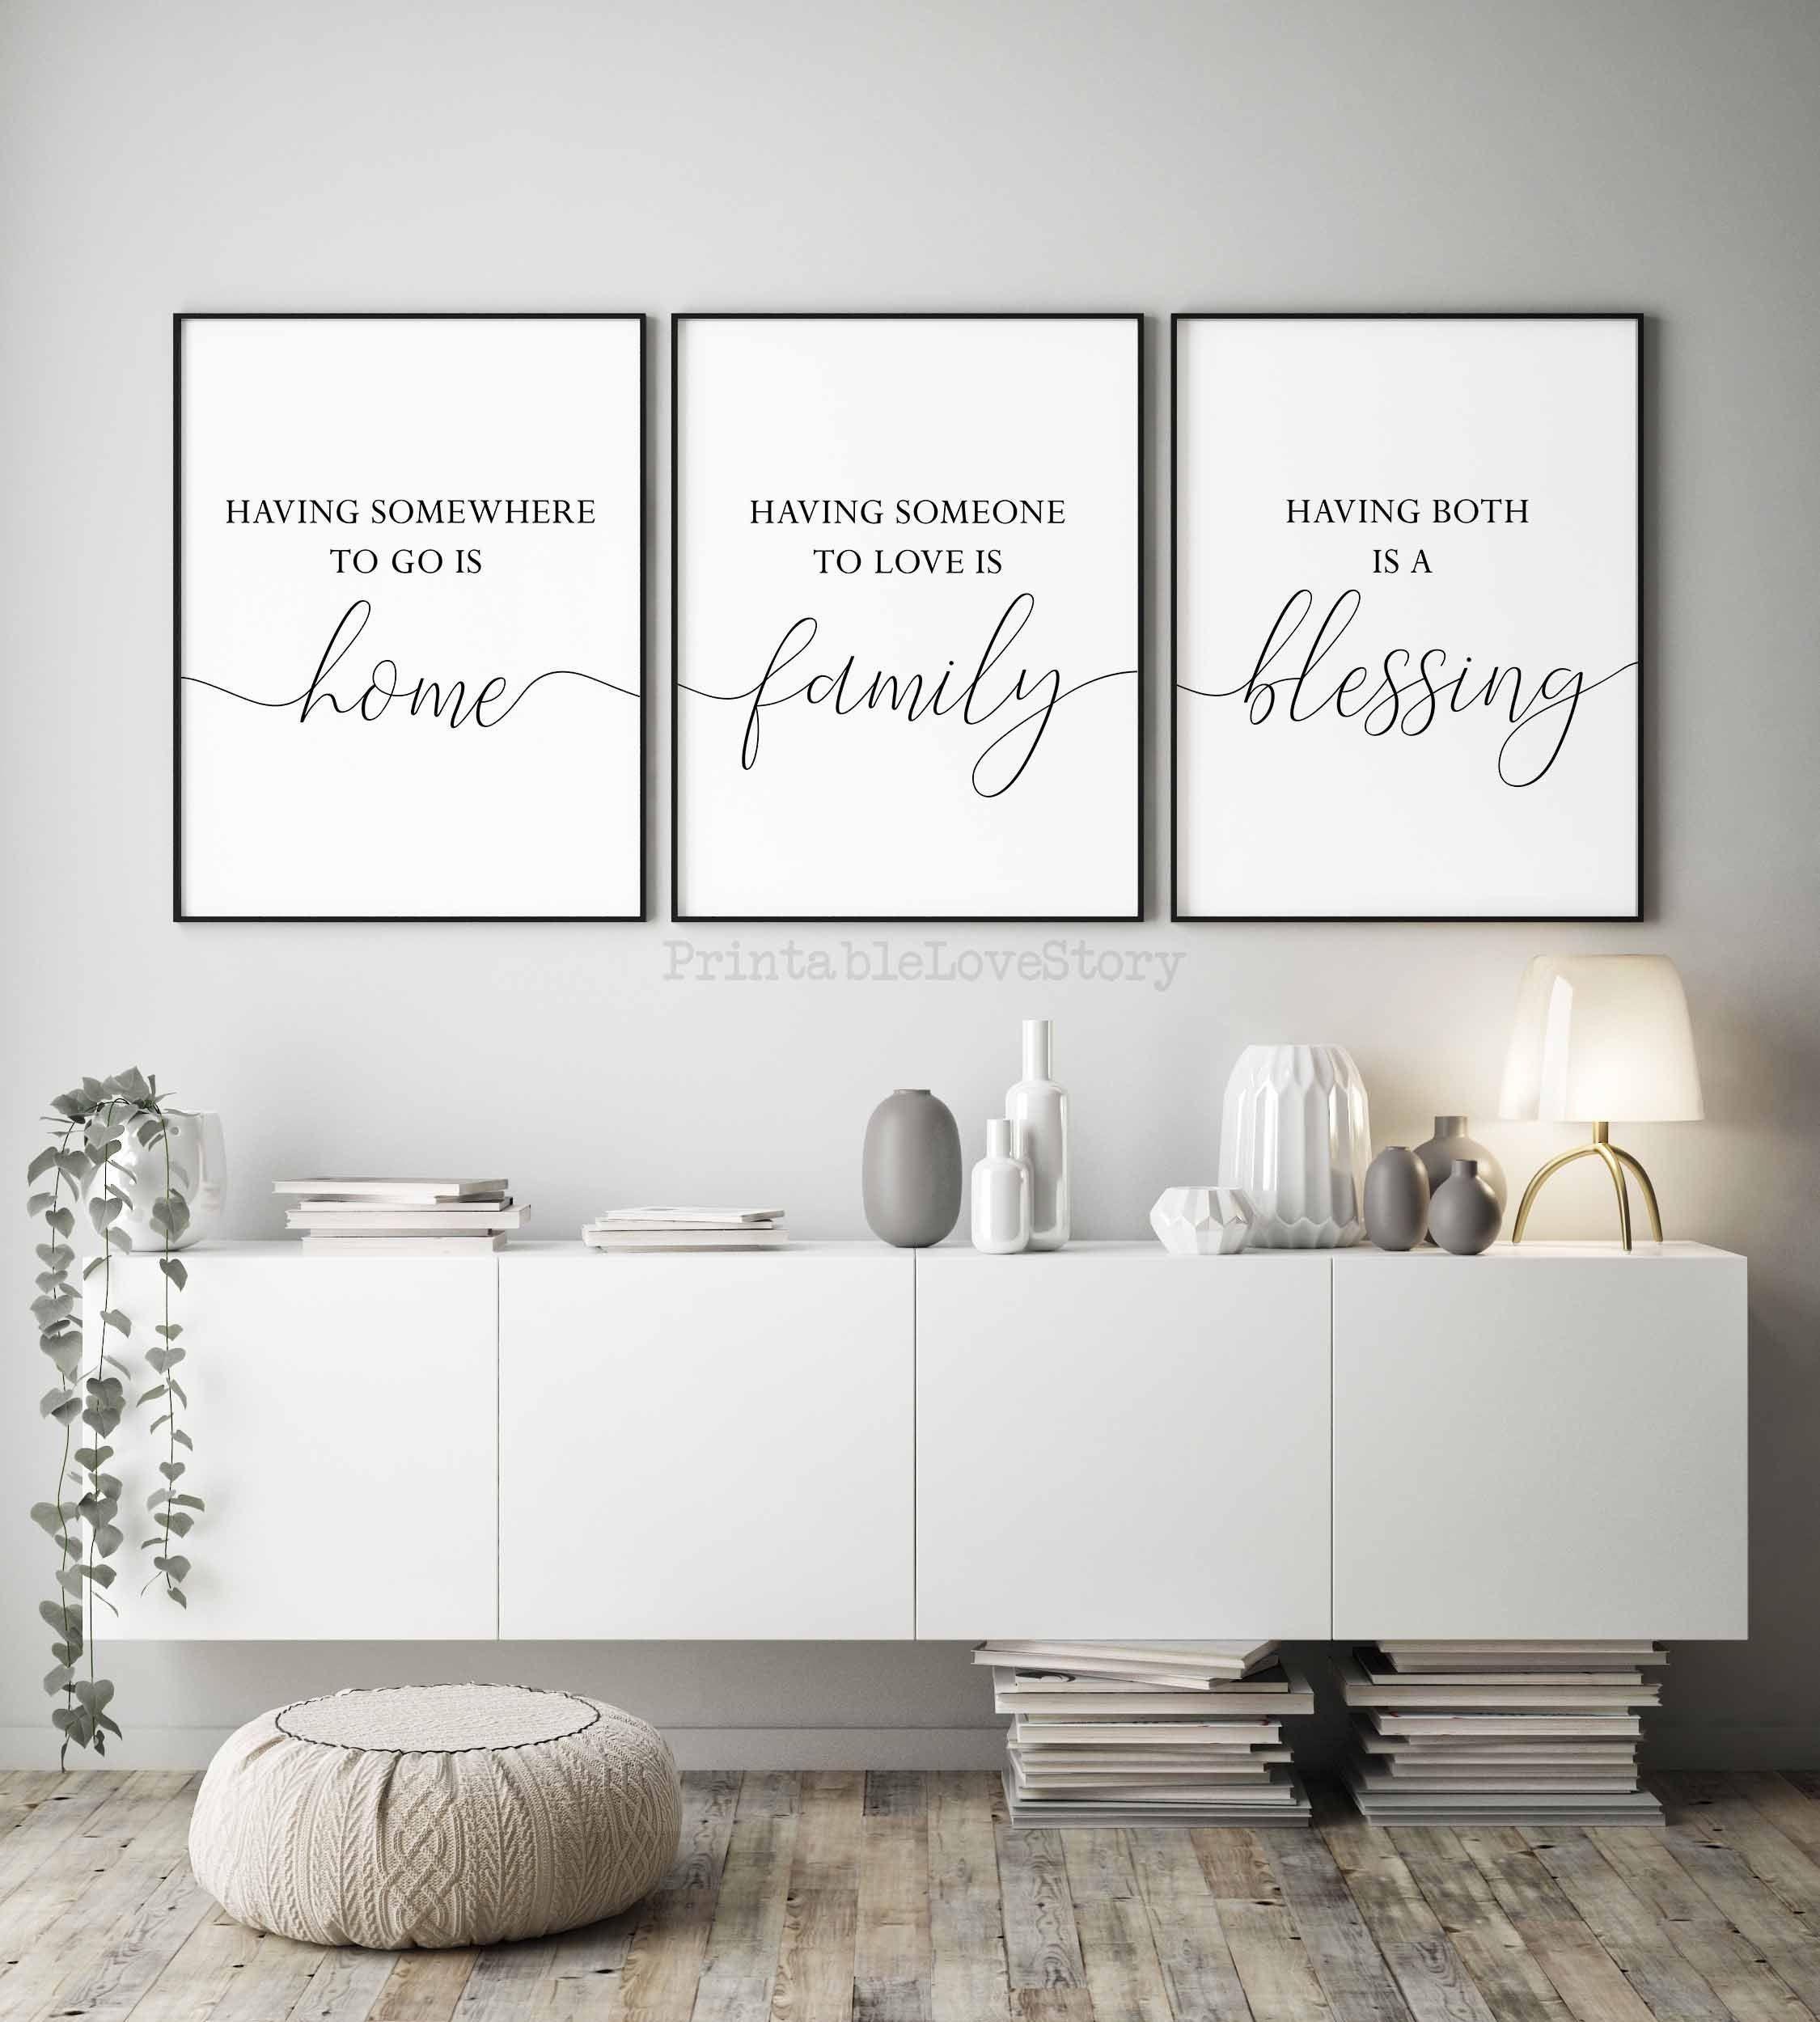 Home Signhome Decorfamily Wall Decorset Of 3 Printsliving Etsy In 2020 Serenity Prayer Wall Art Bible Verse Wall Art Prayer Wall